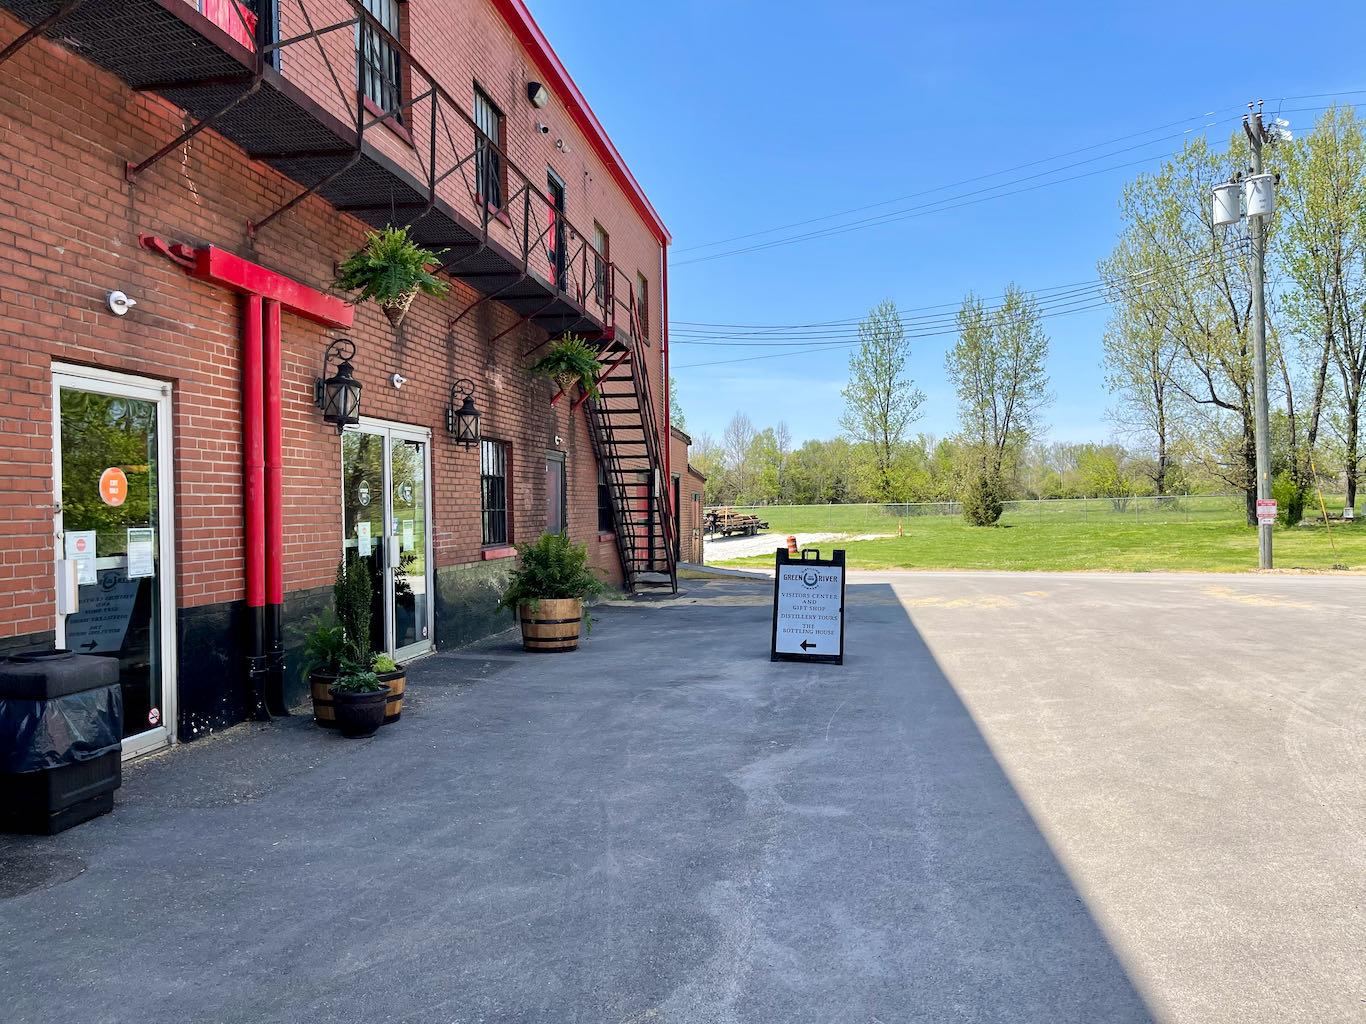 Visitor Center Entrance - Green River Distilling Co